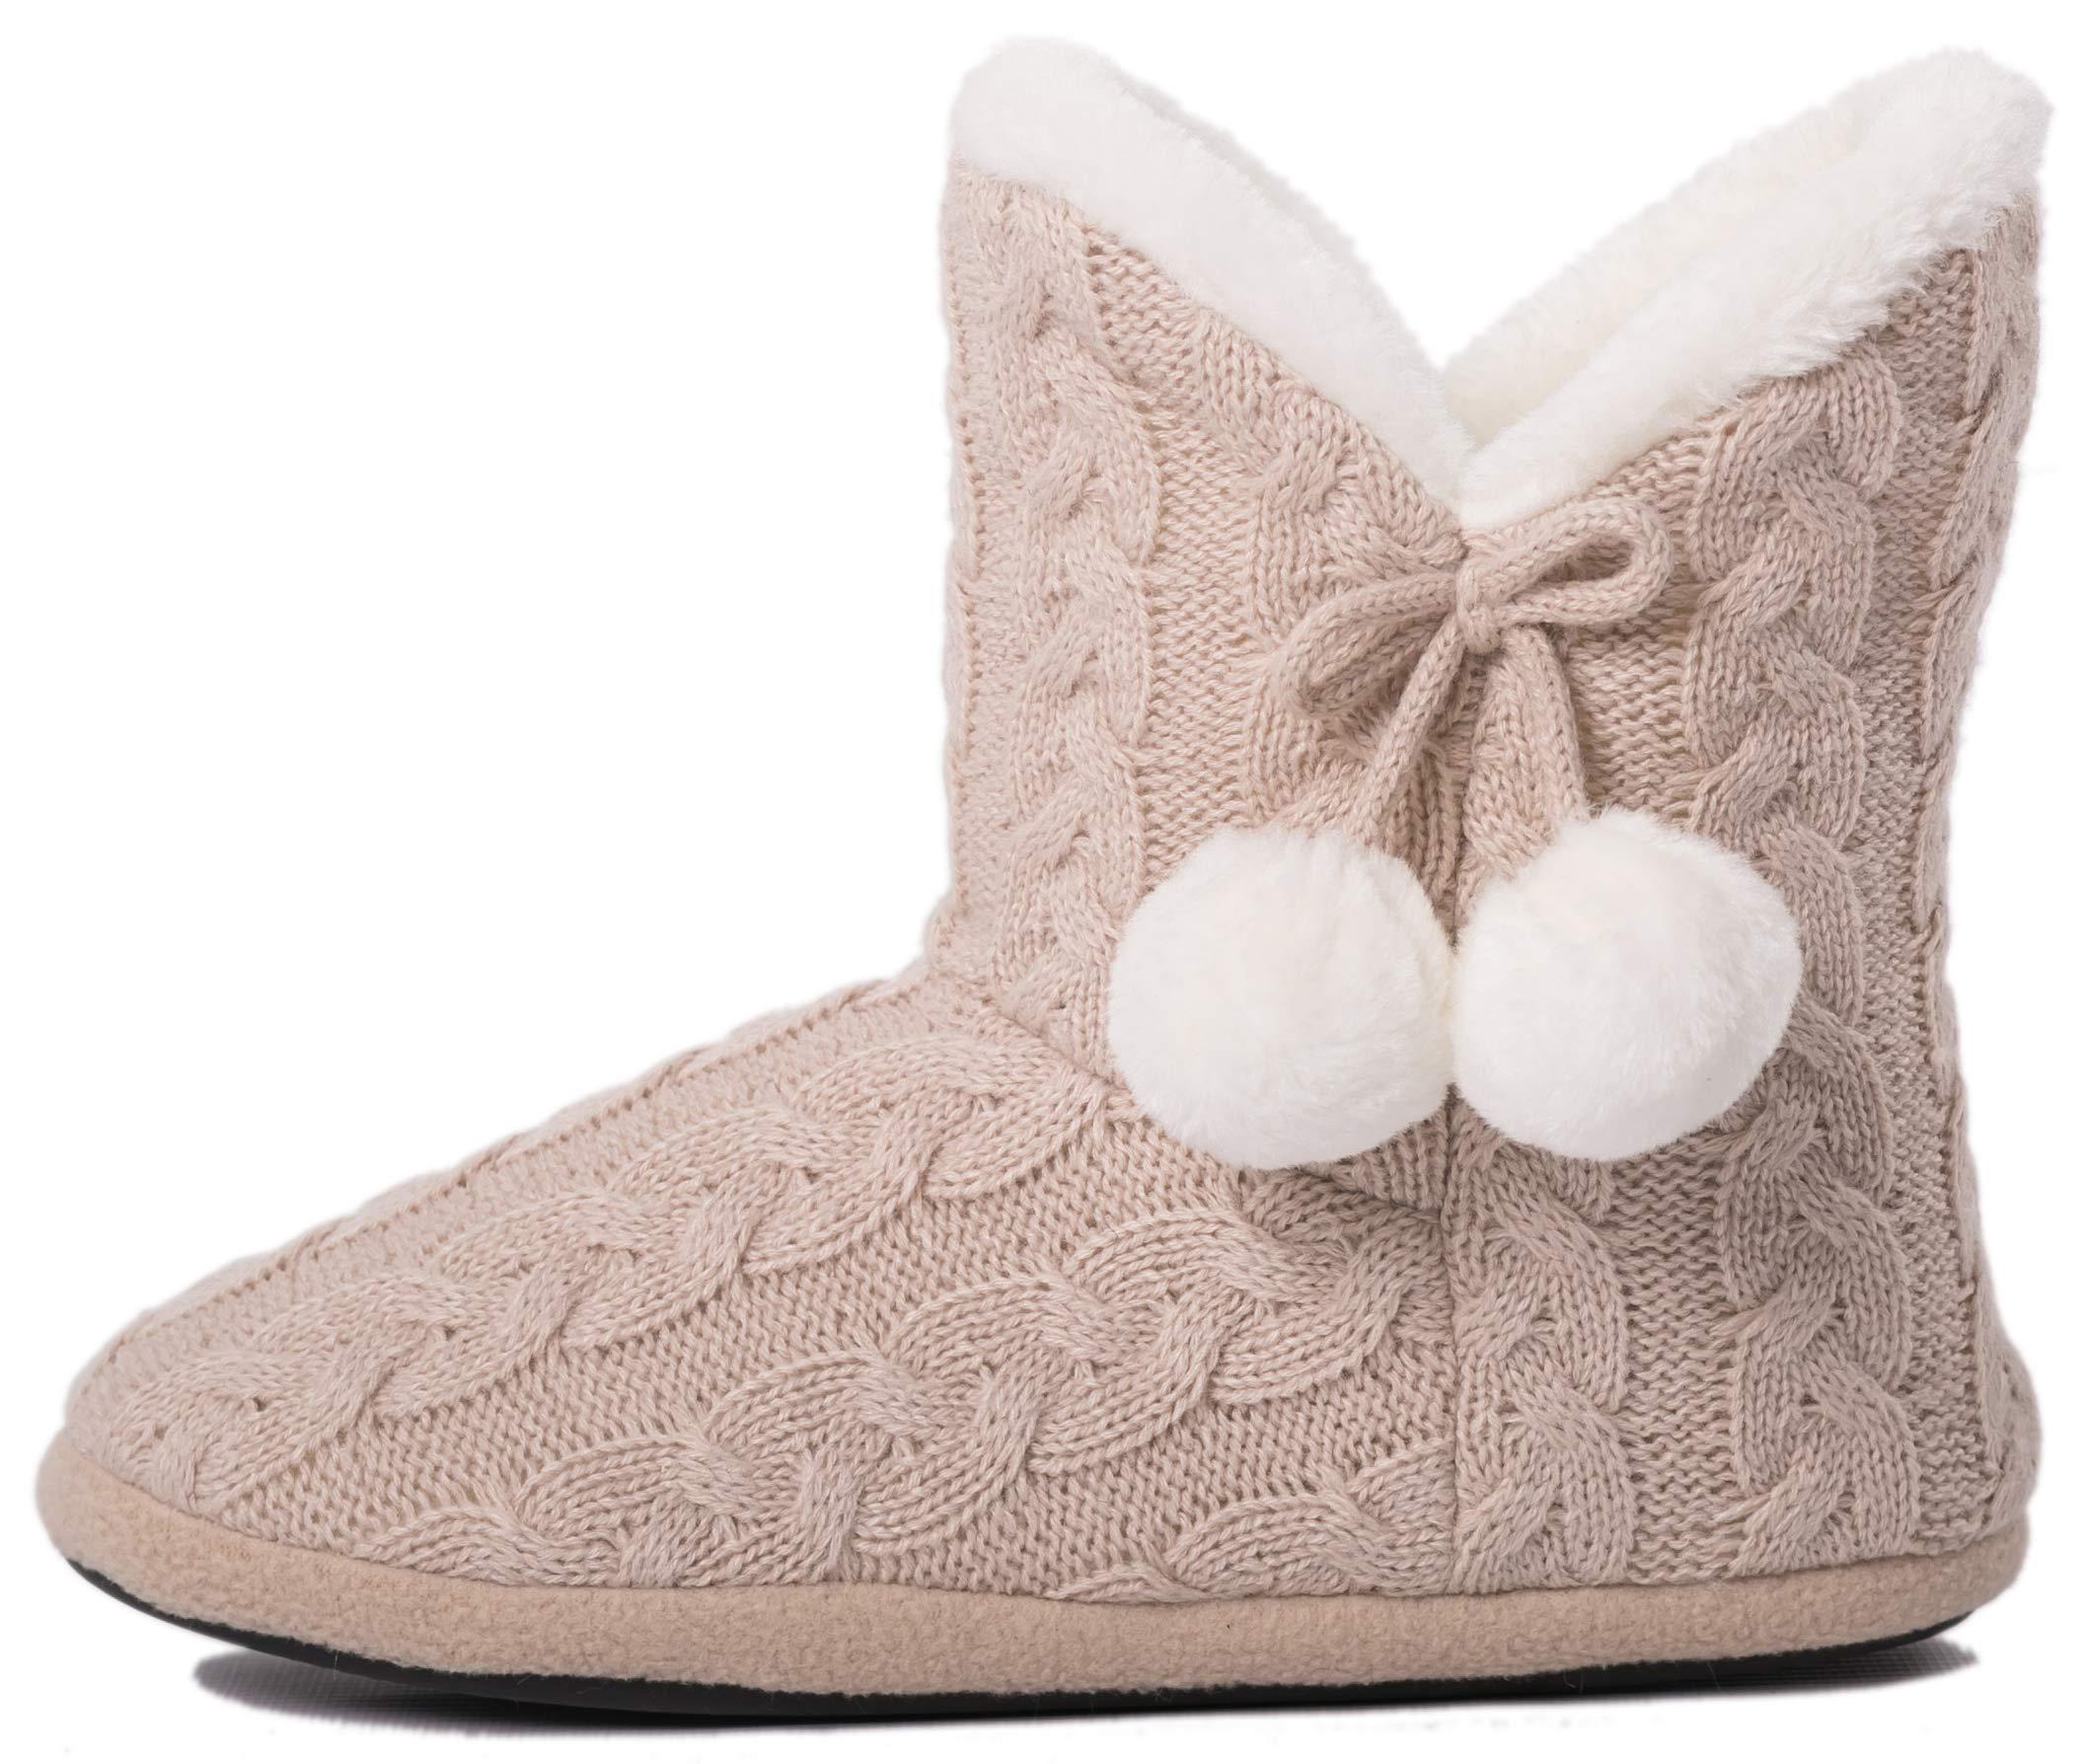 Slippers Women Ladies Slipper Boots